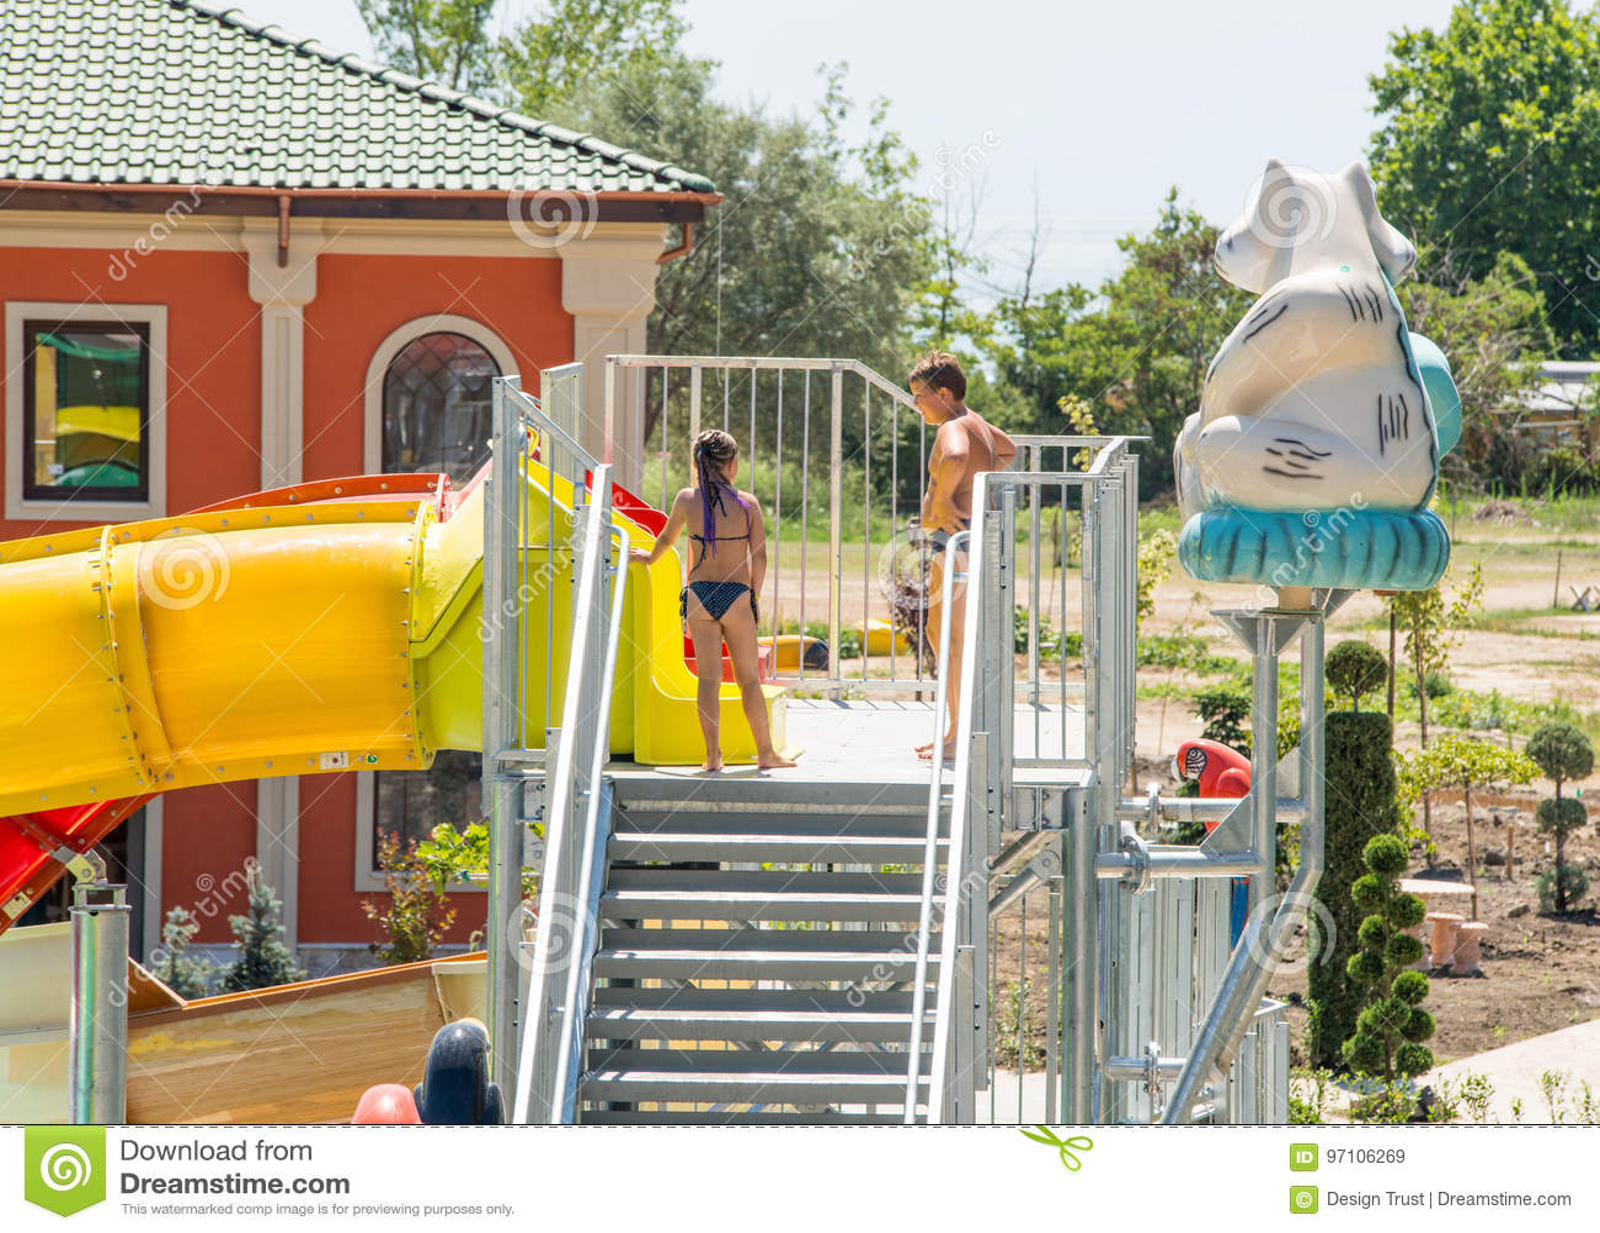 Children In An Indoor Water Park In A Five-star Hotel In